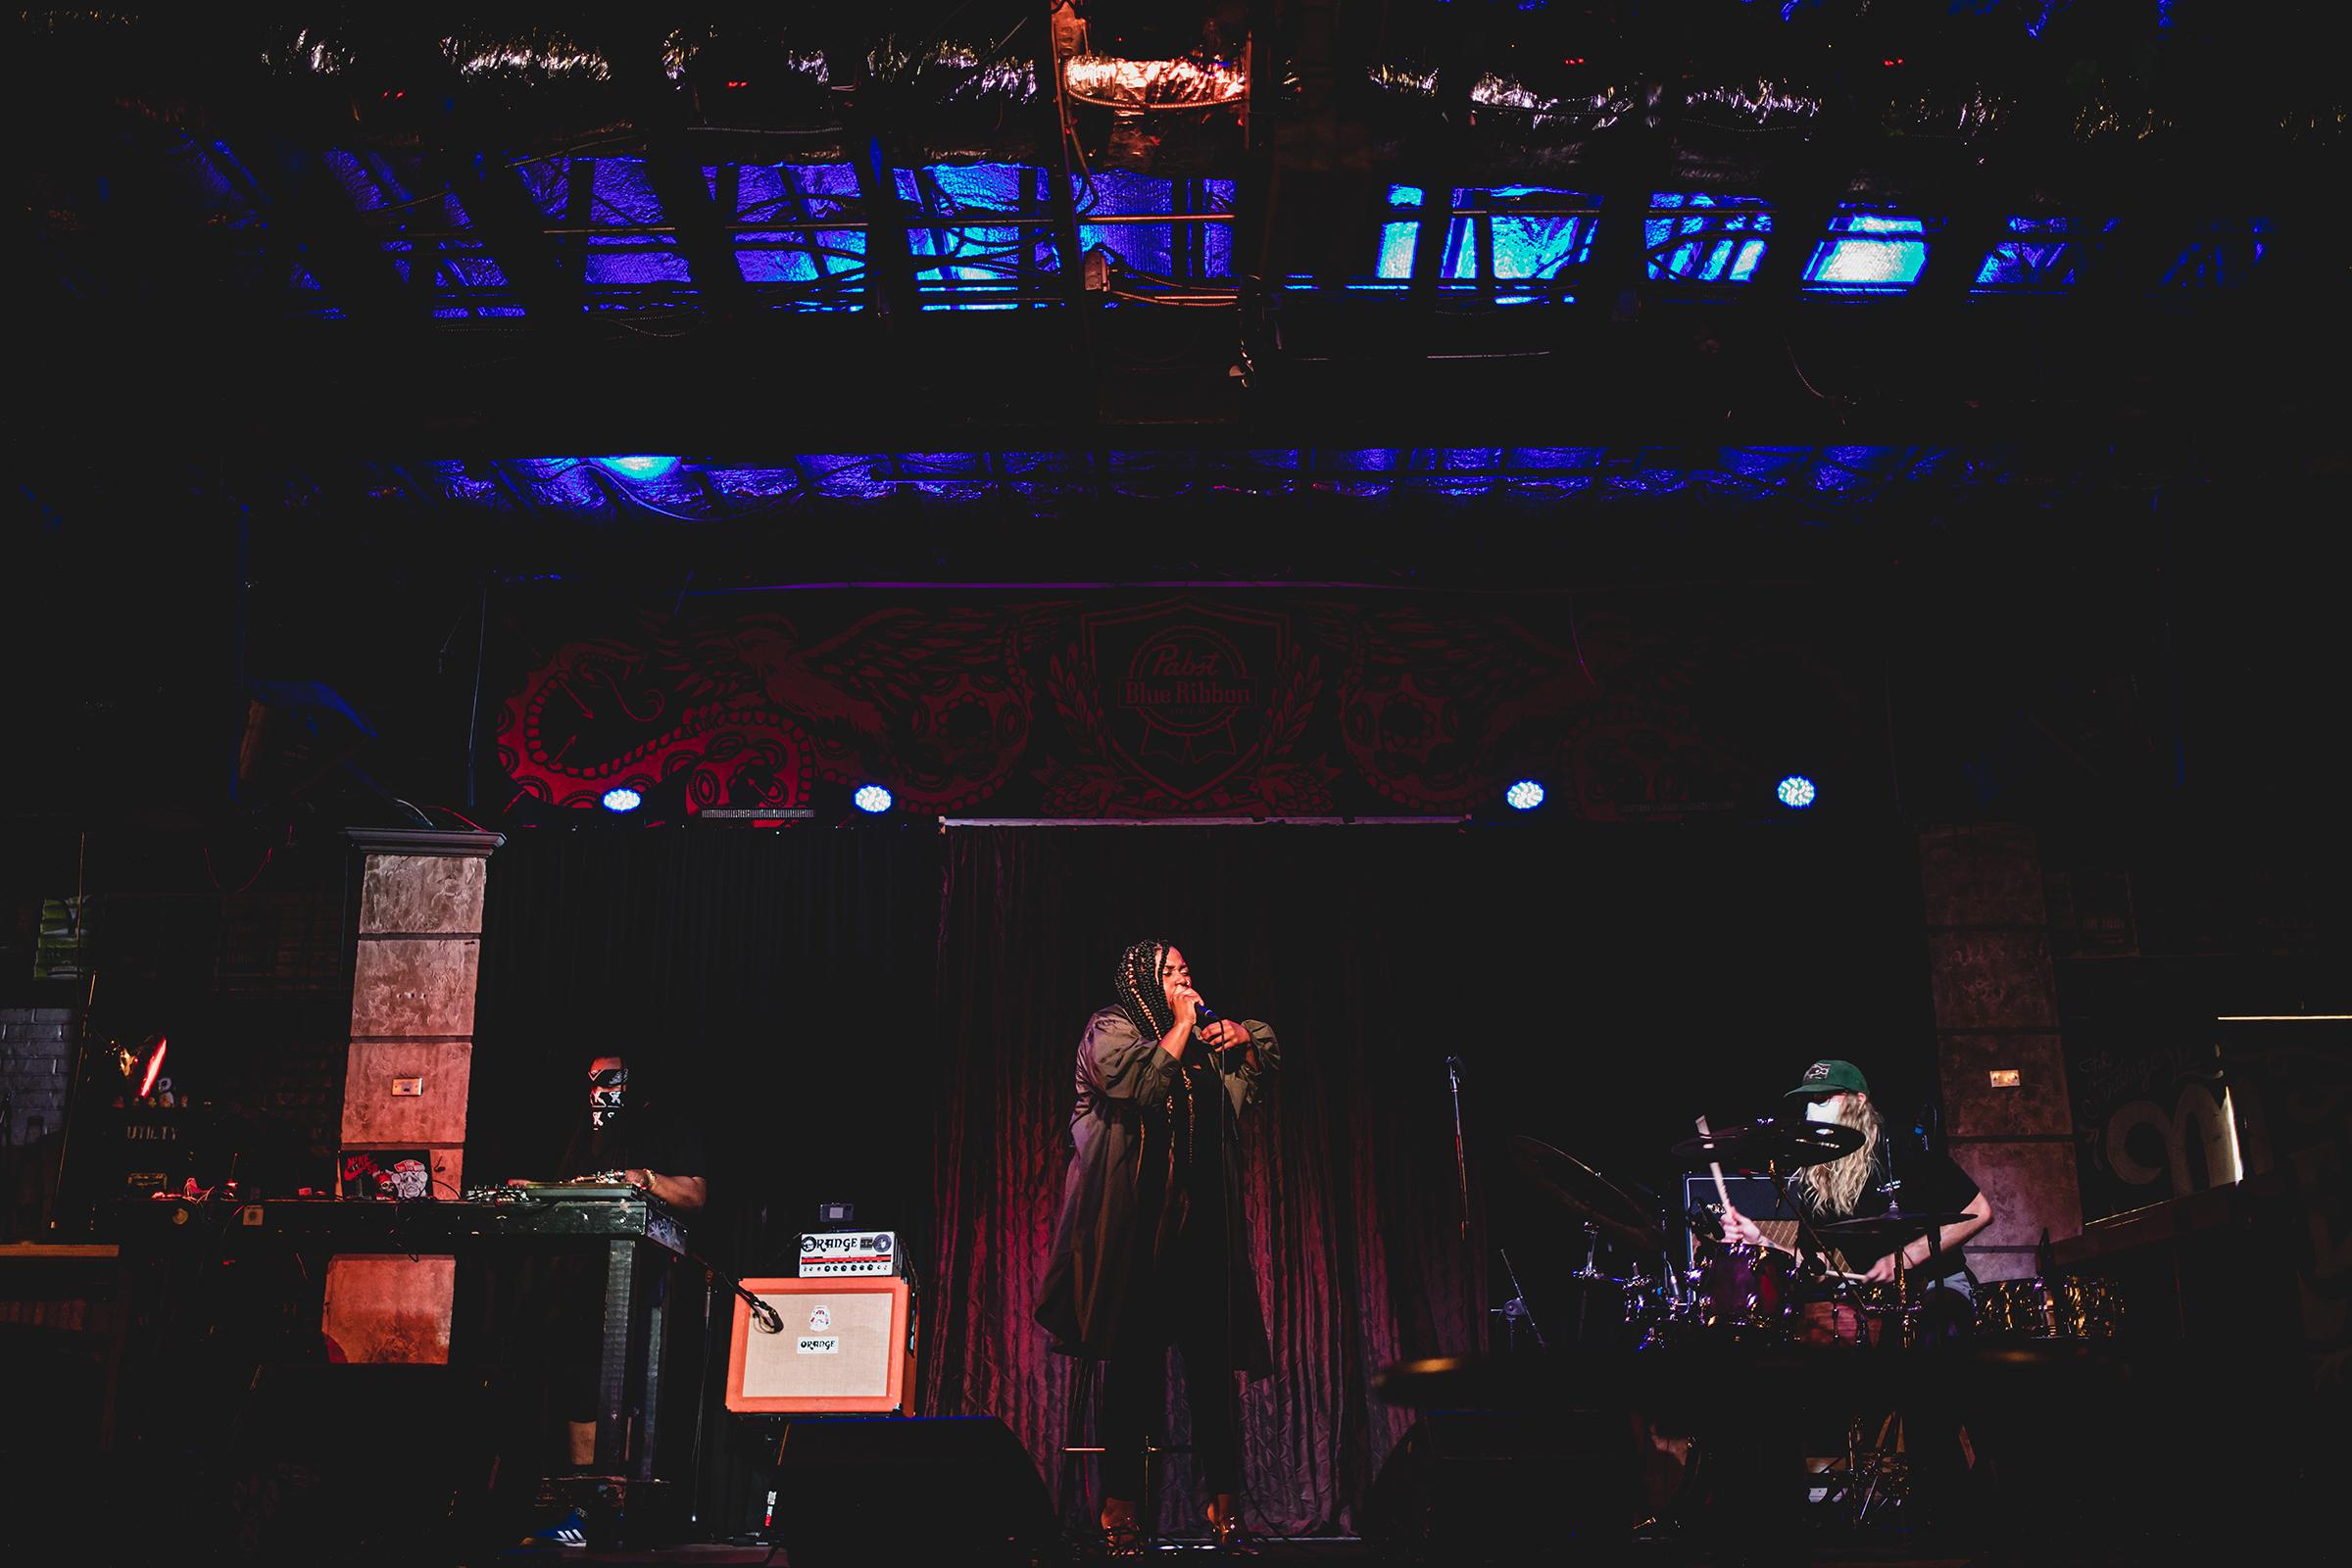 A performance at Crowbar in Tampa, Florida, 2020.